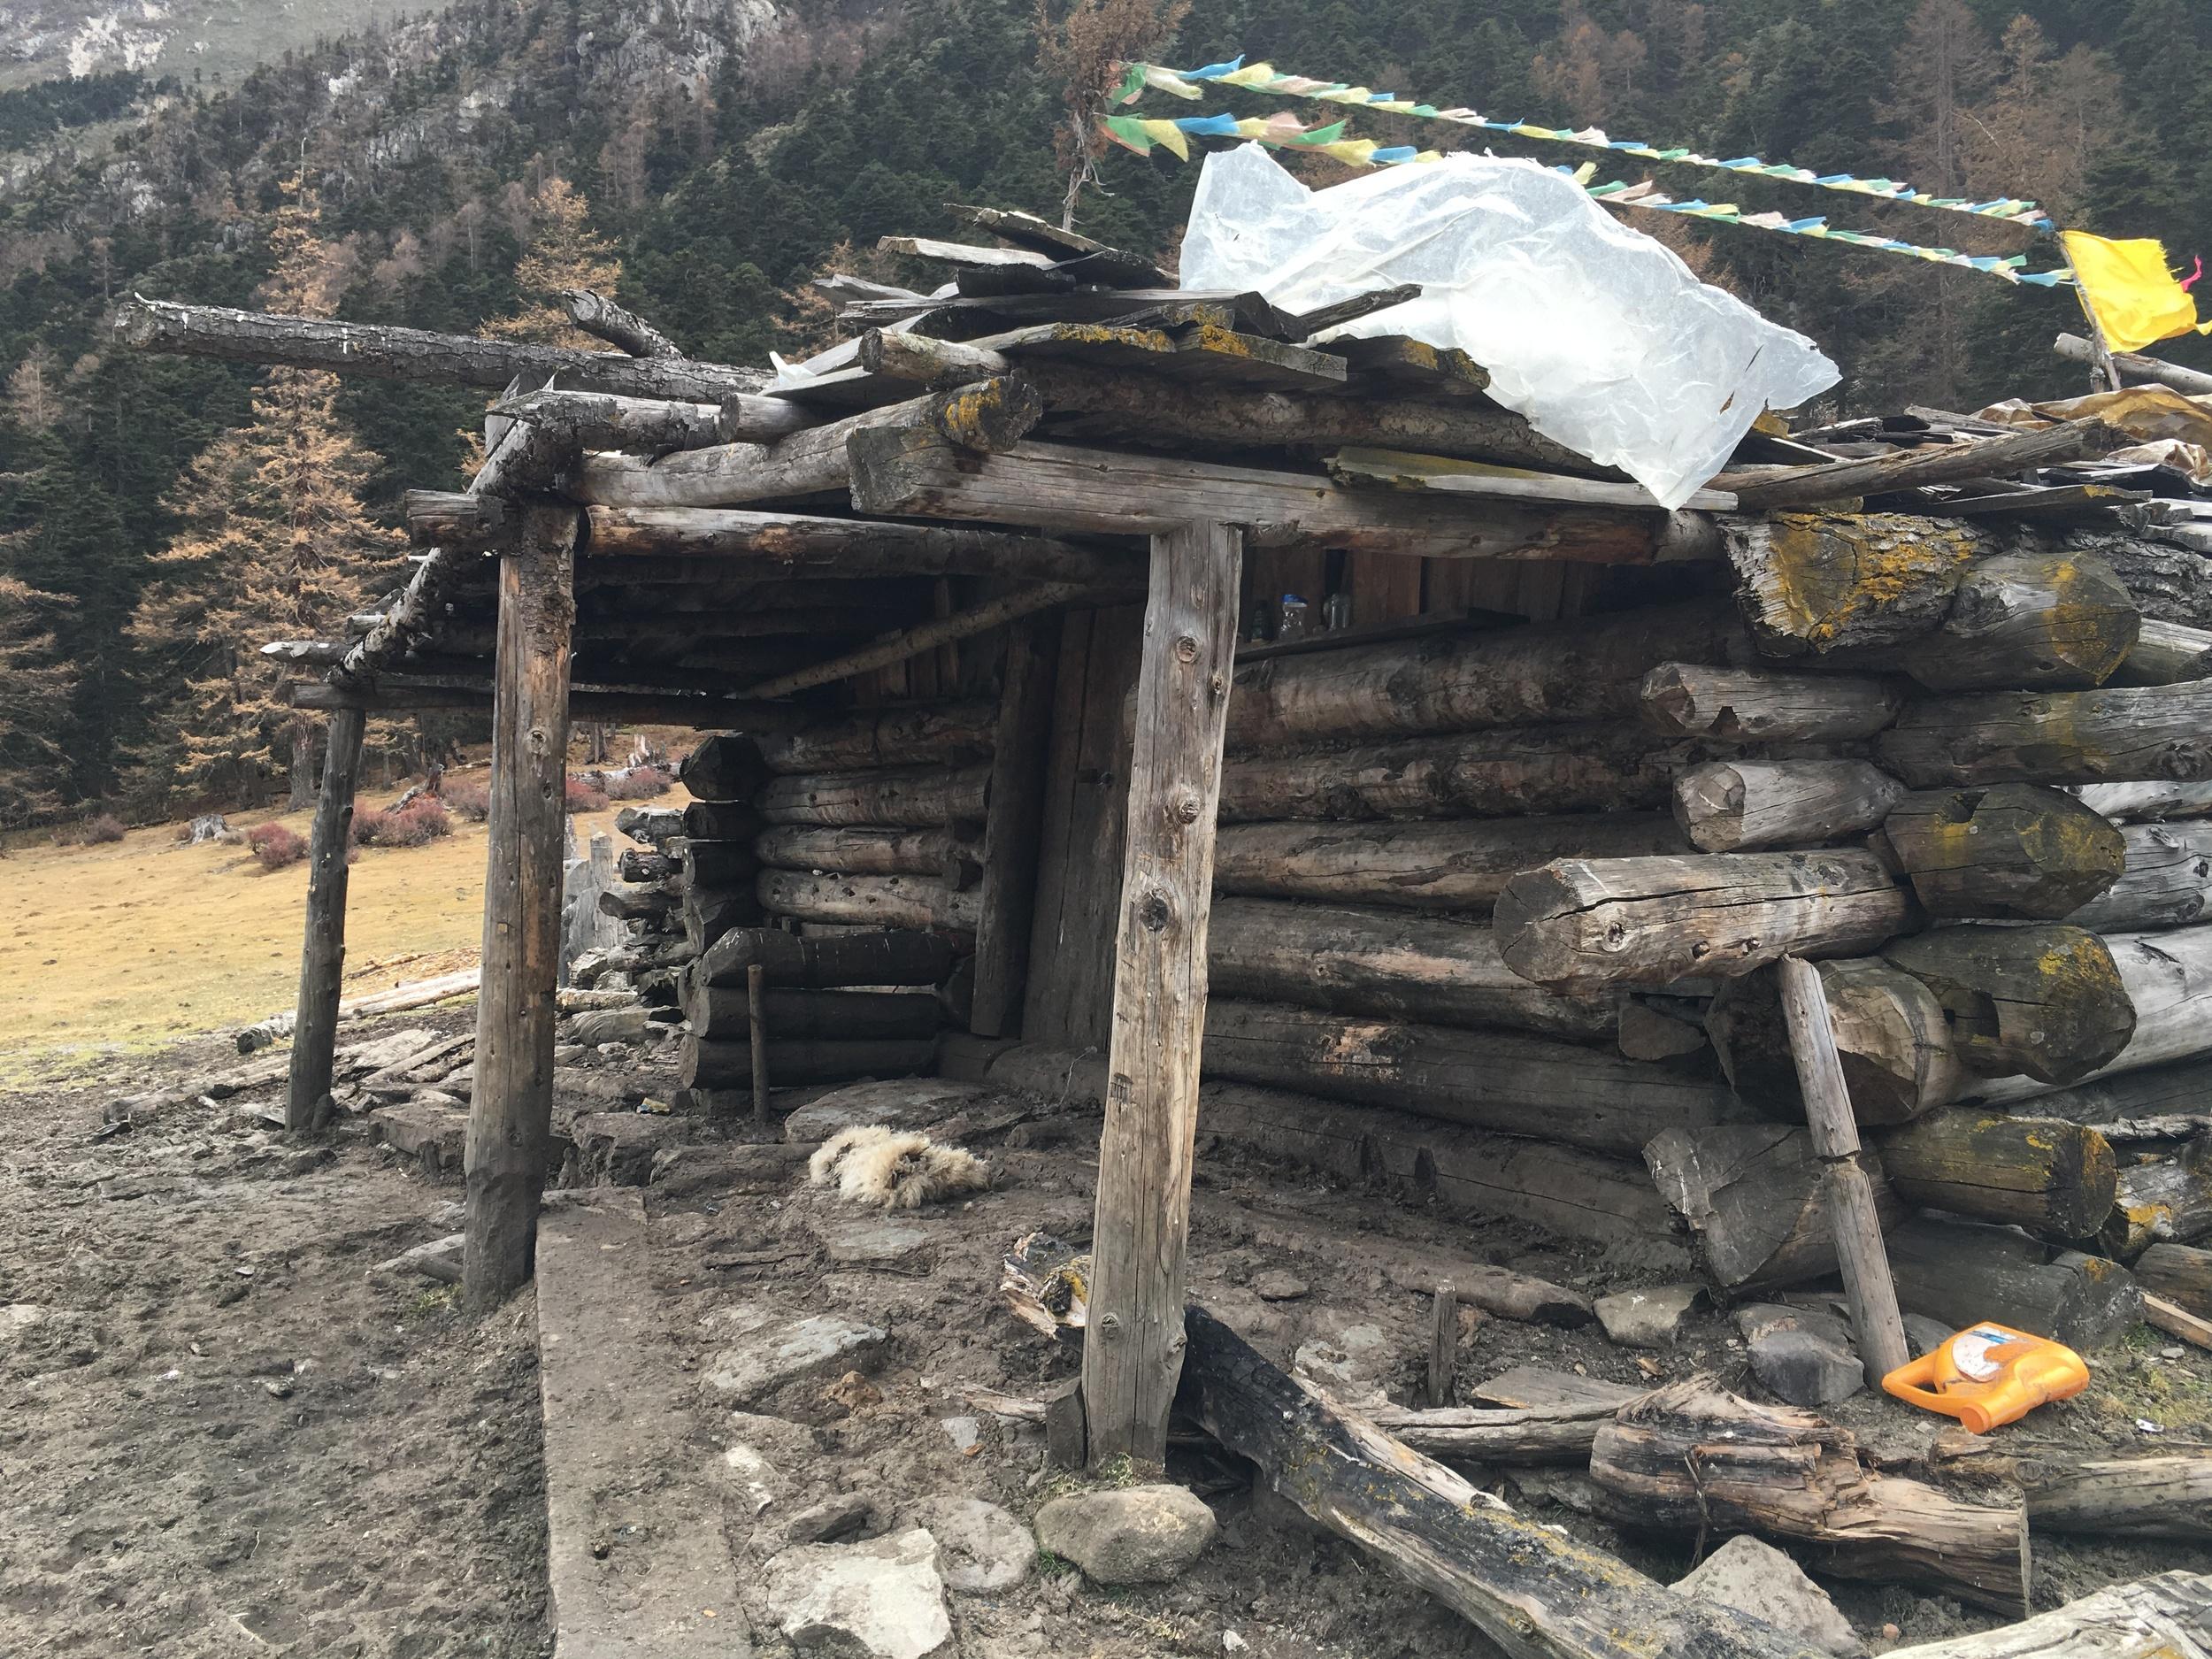 Tibetan Nomad house, abandoned for winter